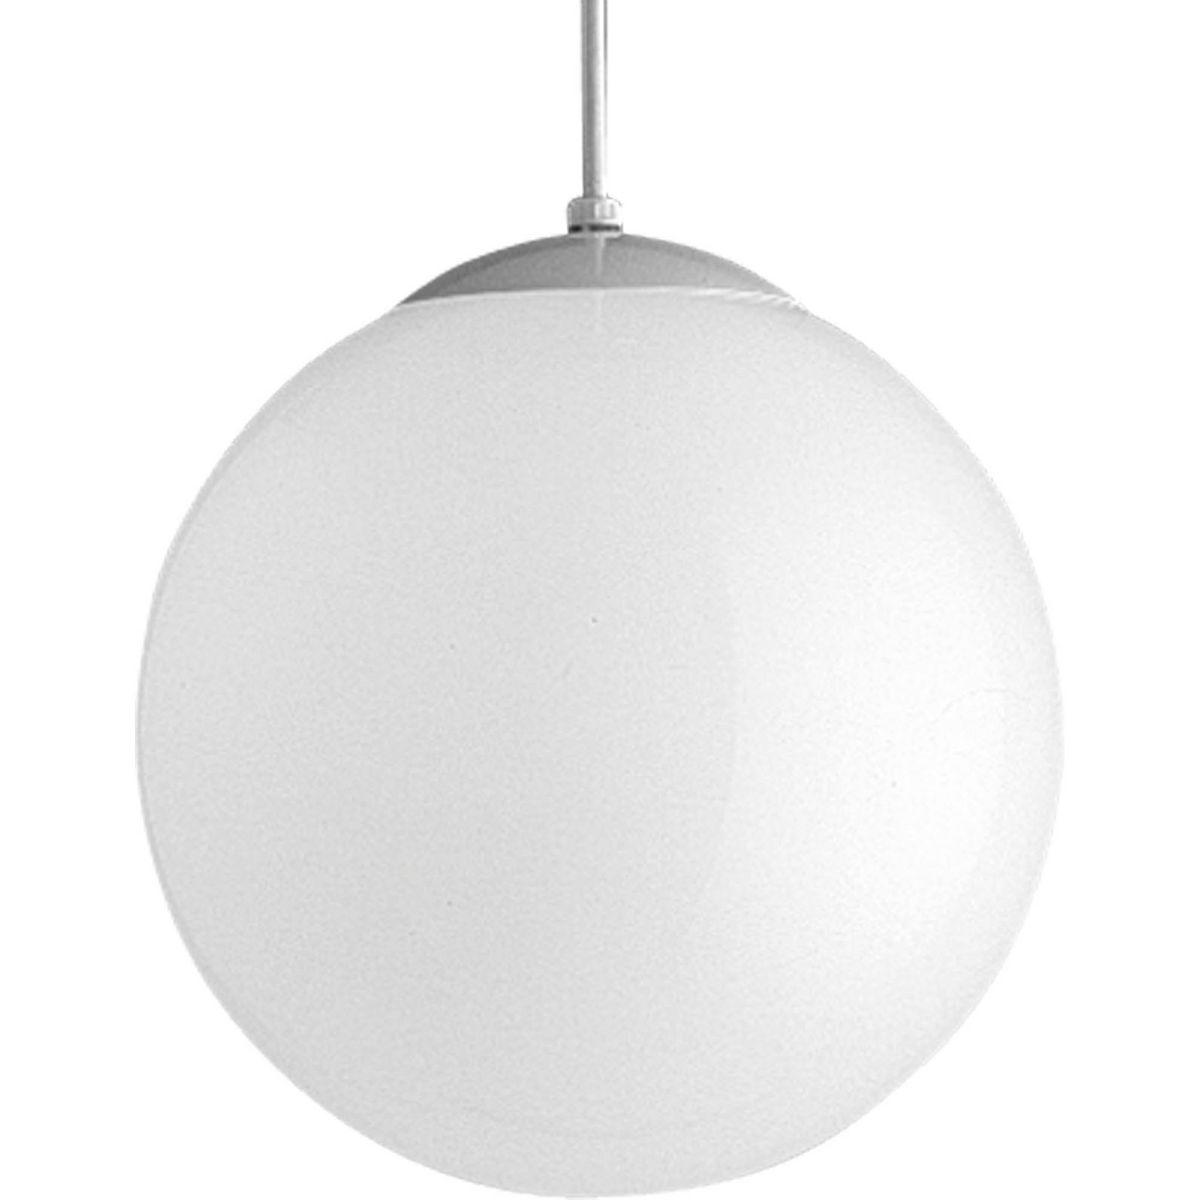 Opal Globes One Light Pendant P4403 29 Progress Lighting